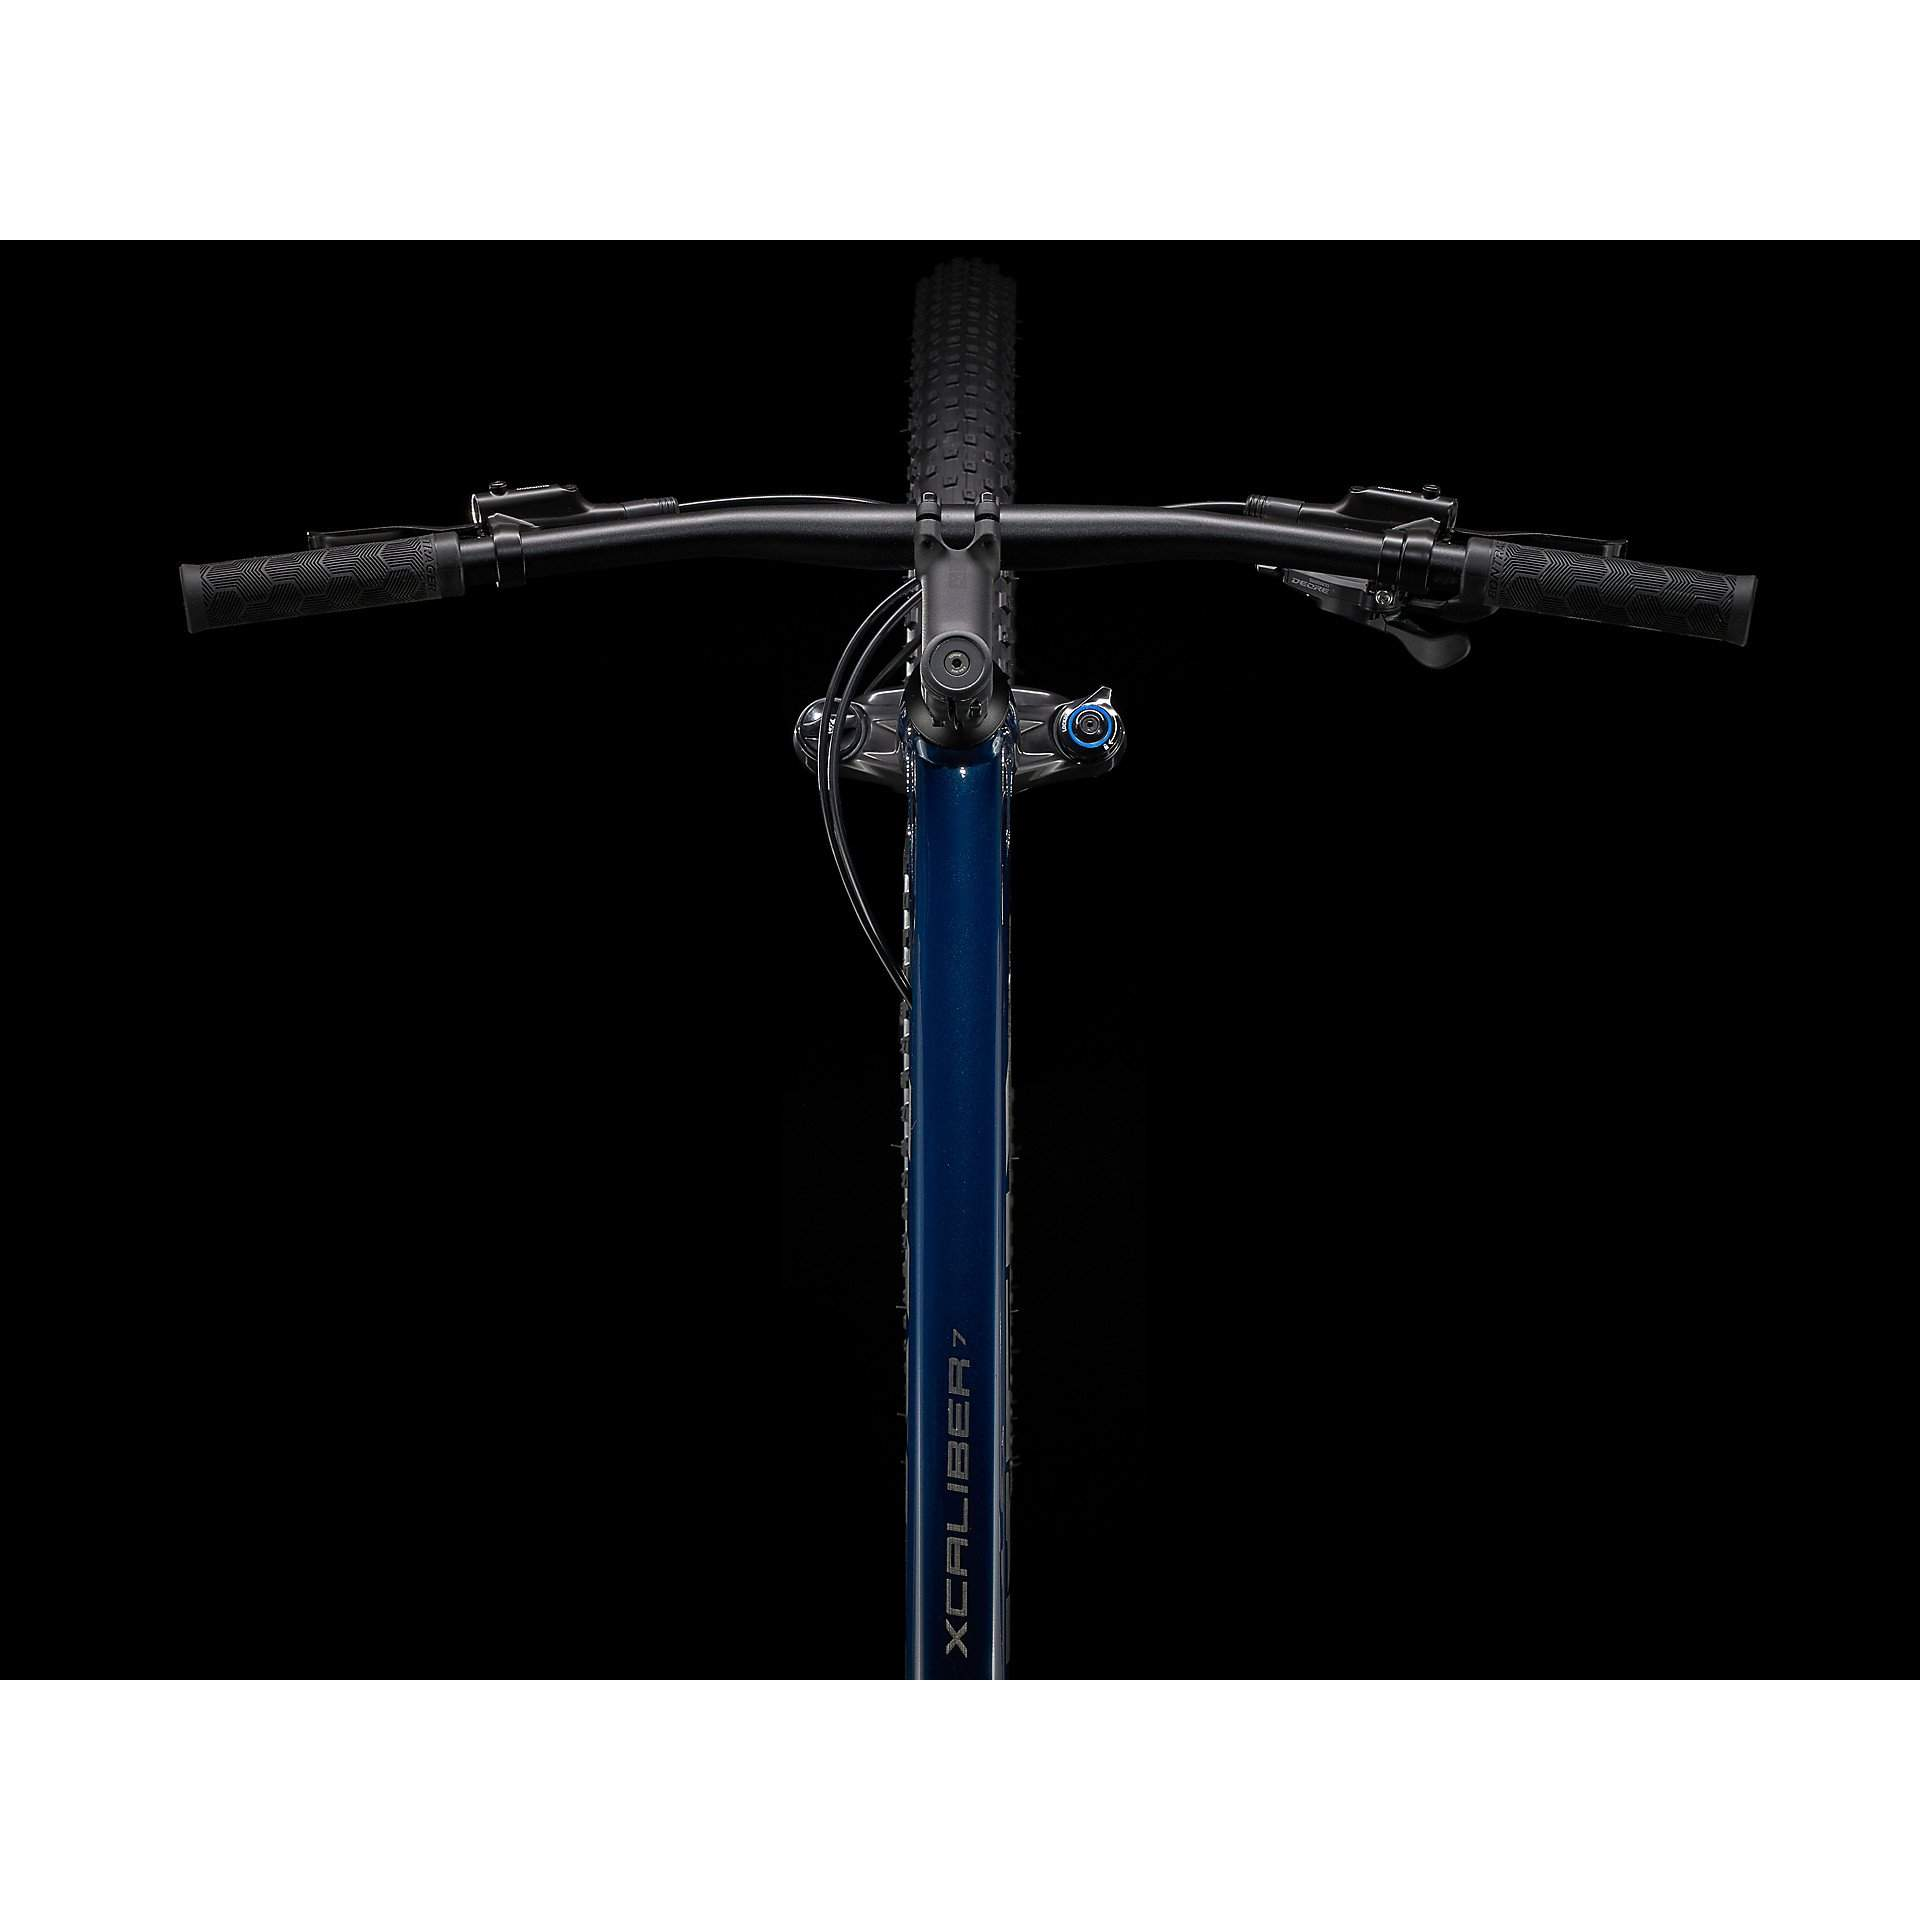 ROWER TREK X-CALIBER 7 MULSANNE BLUE ANTHRACITE 92